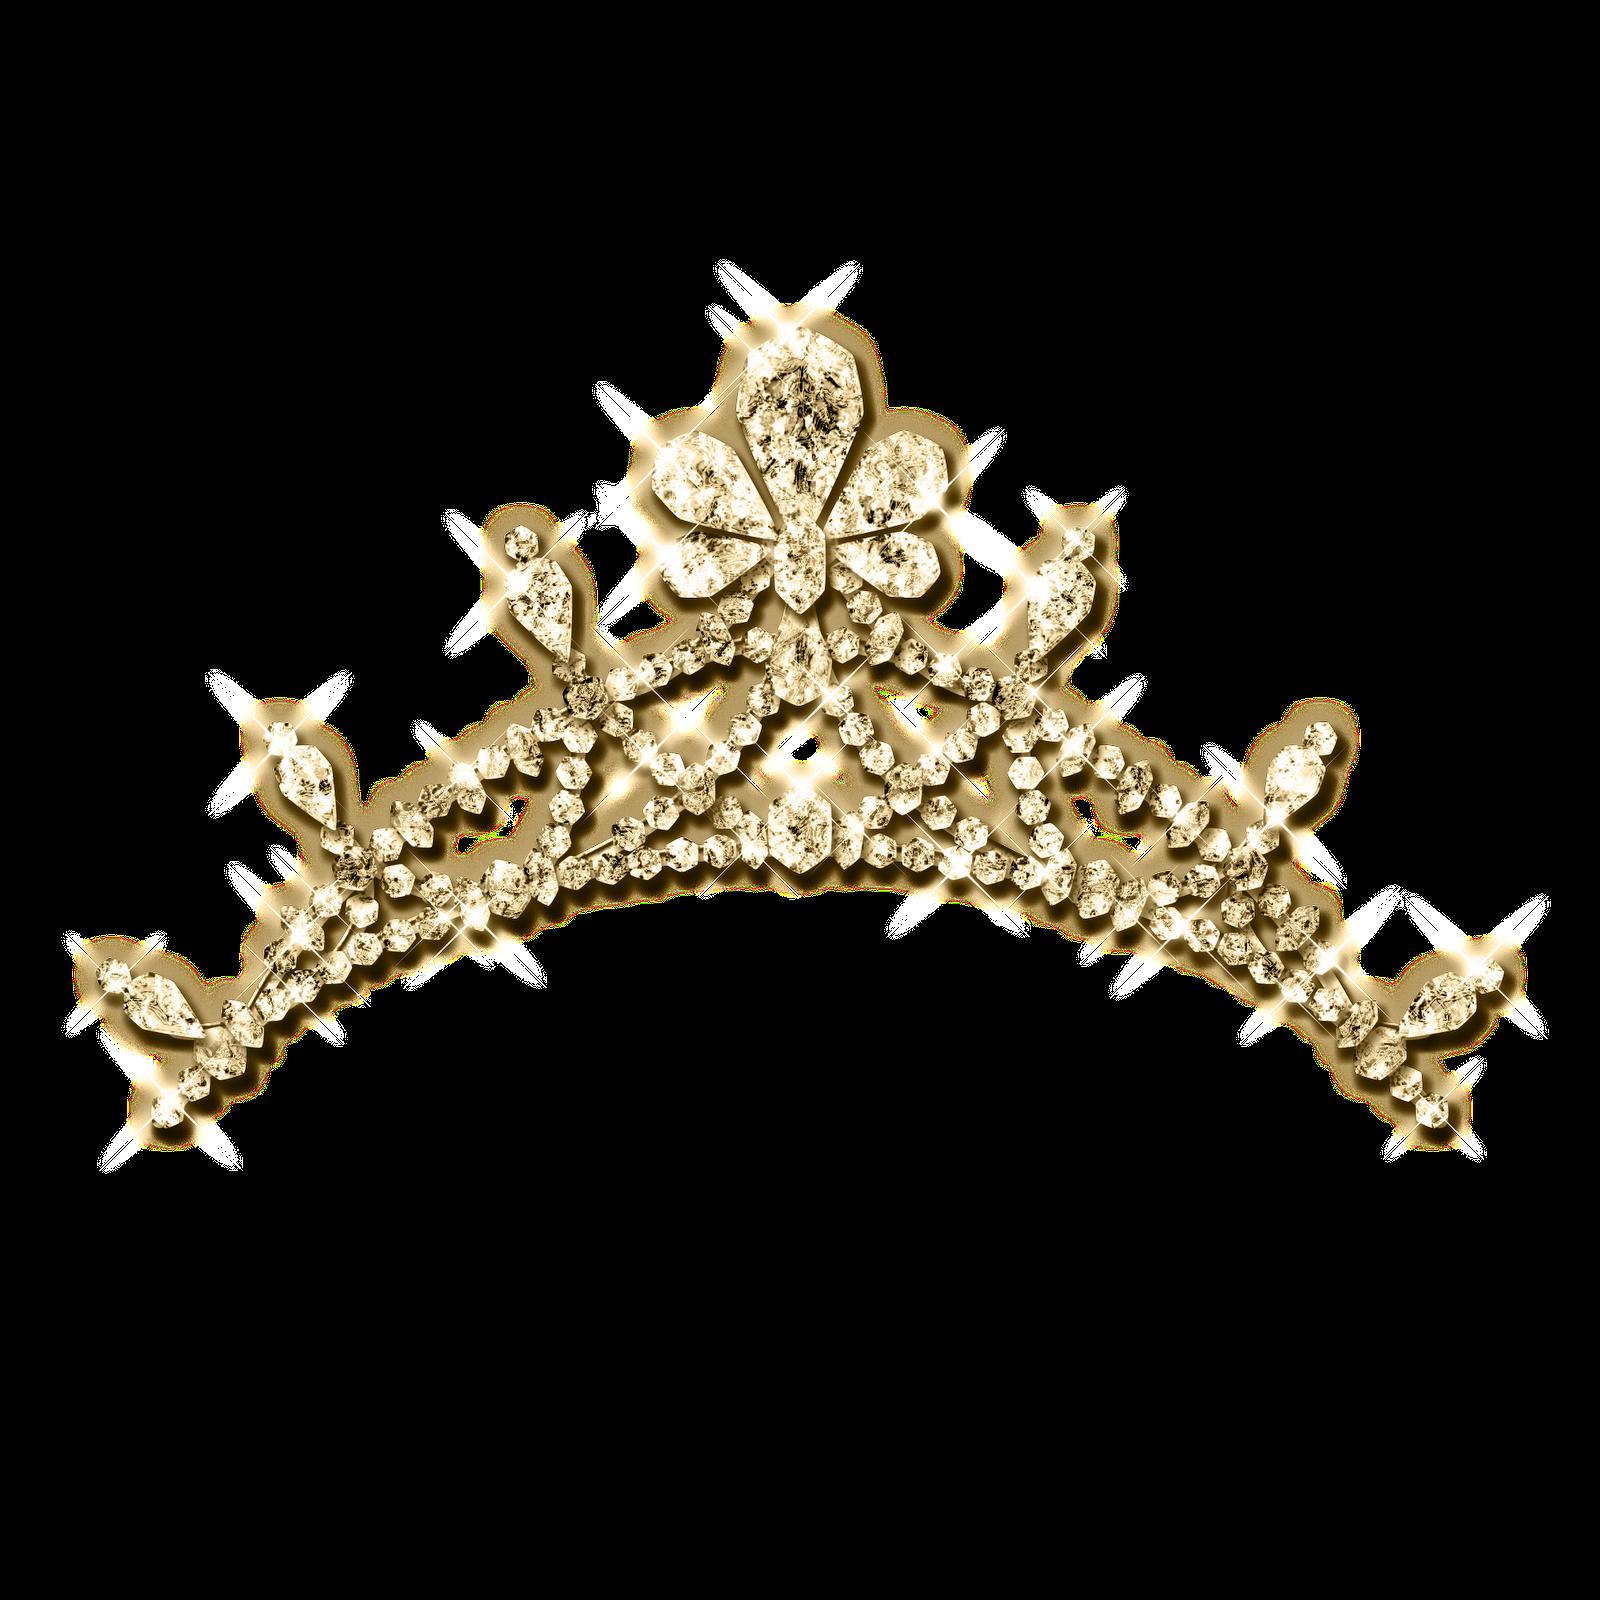 transparent png tiara with star   ZOOM DISEÑO Y FOTOGRAFIA: tiaras ,coronas  png transparente - PNG Tiara